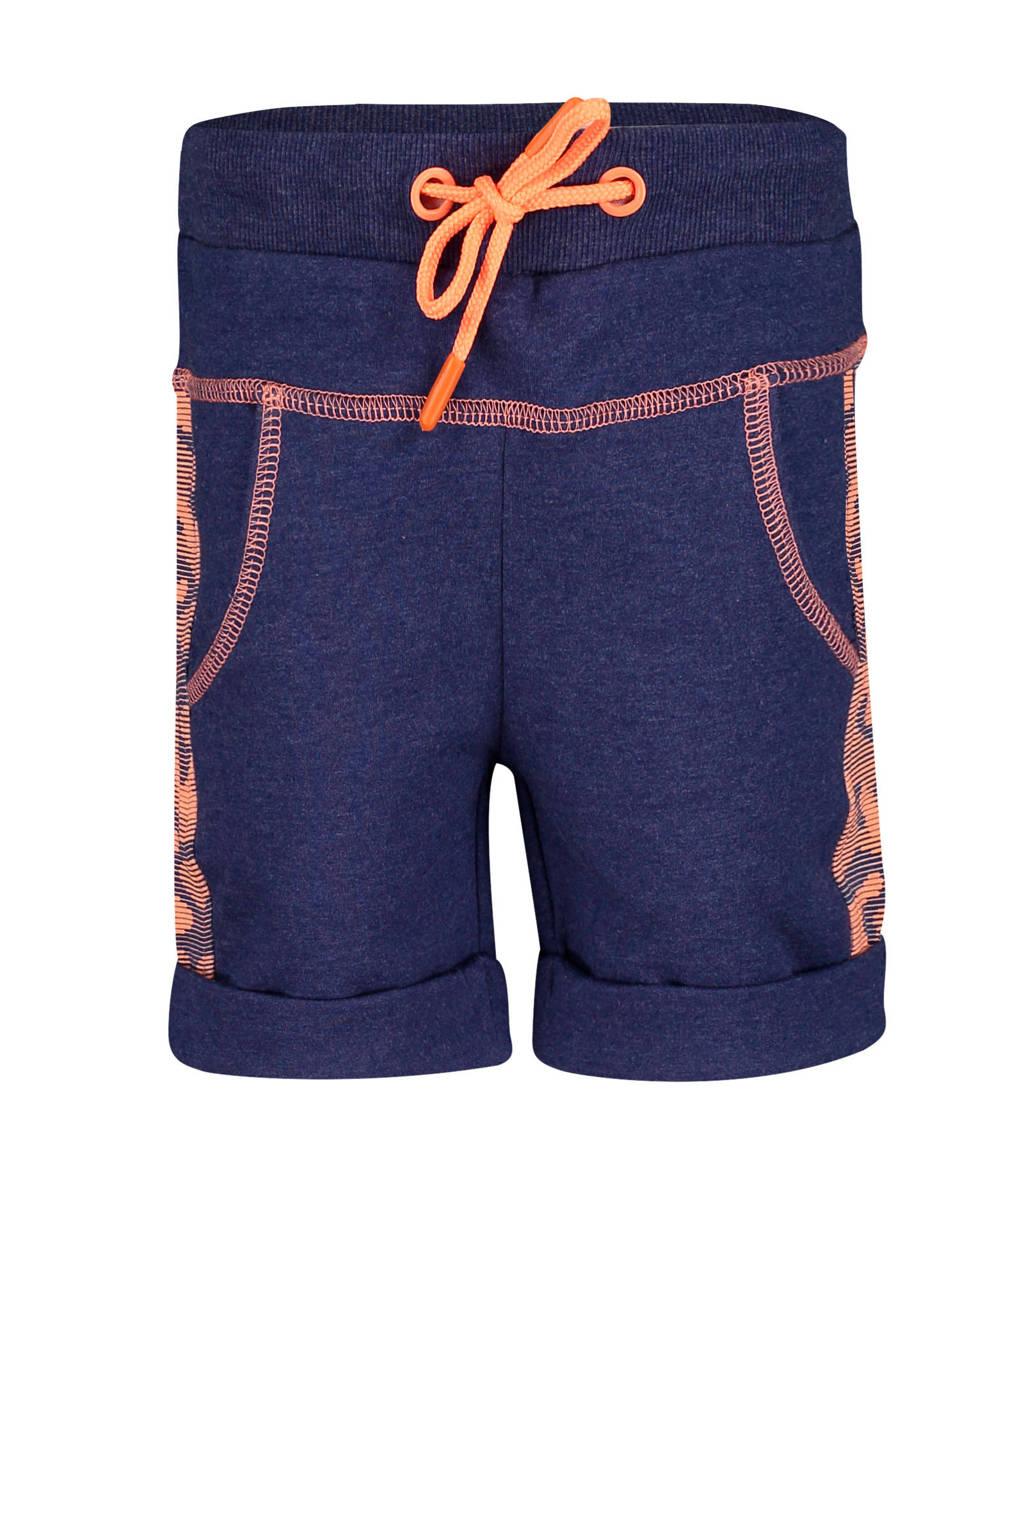 4PRESIDENT regular fit sweatshort Ivan donkerblauw/oranje, Donkerblauw/oranje